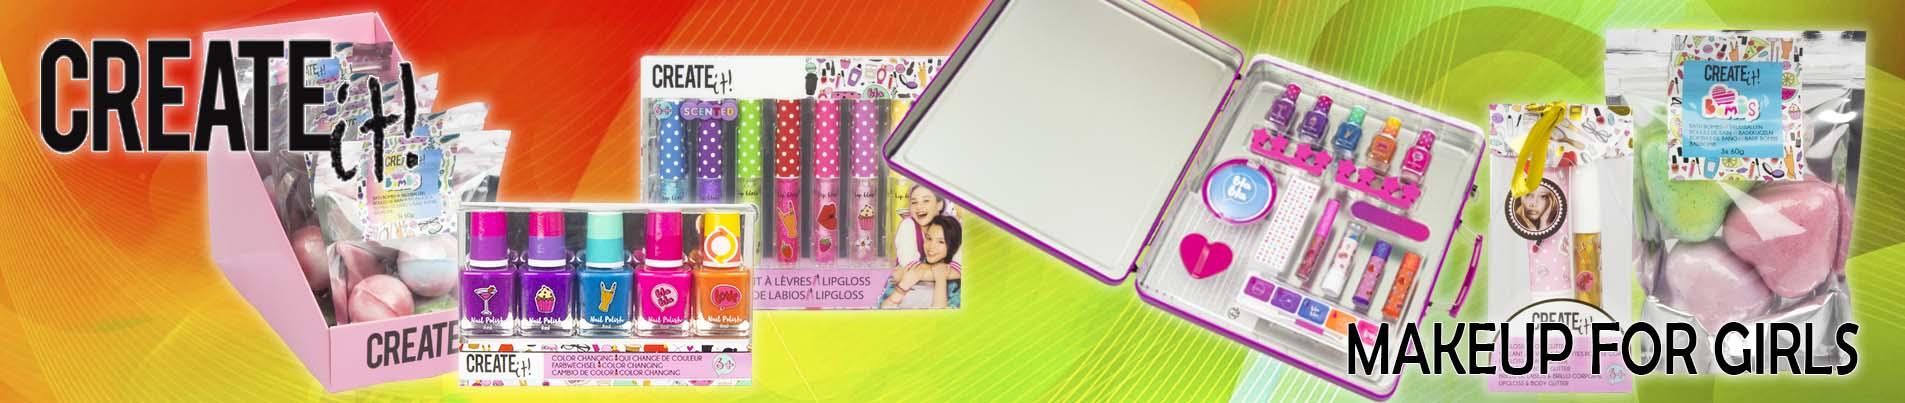 Make-up for girls wholesale distributor